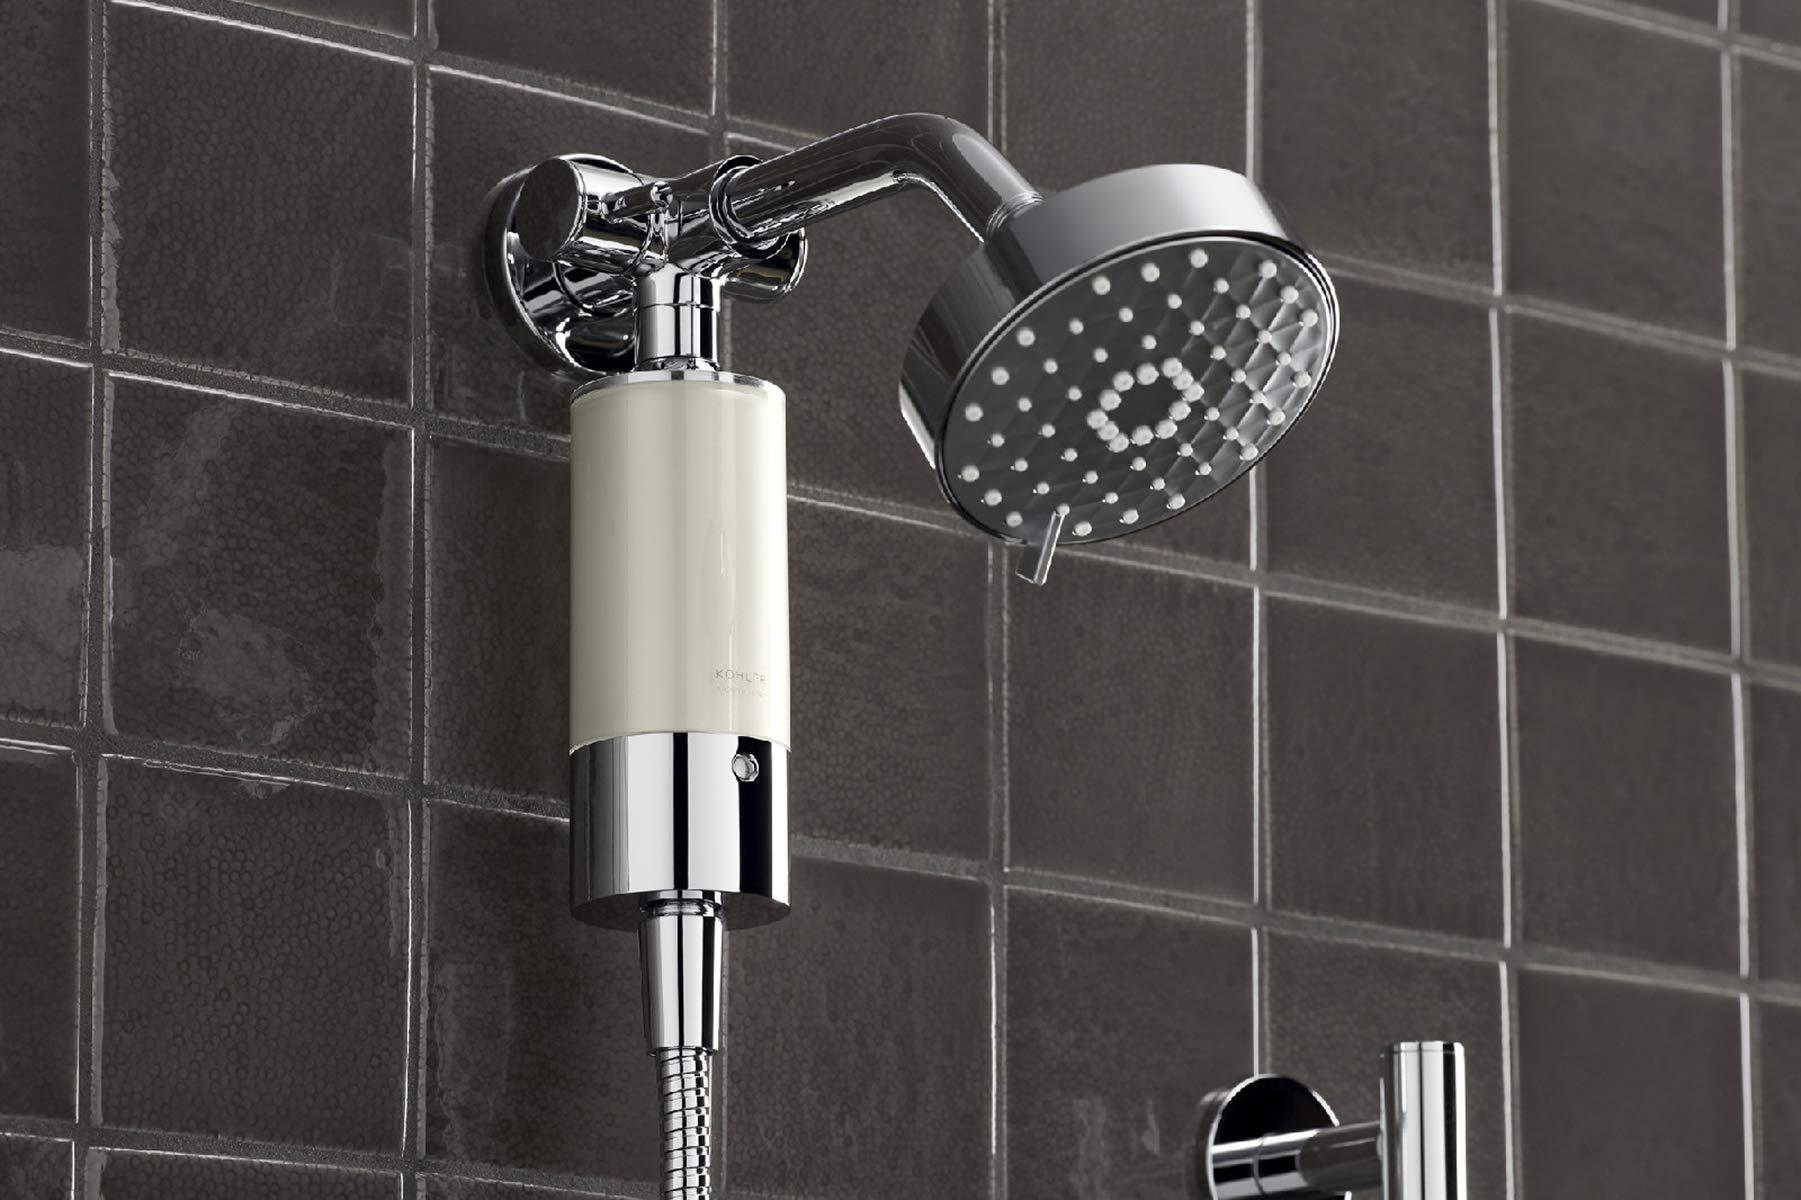 Kohler 30646-CP Aquifer Shower Water Filtration System, Reduce Chlorine and Odor, Includes Filter Replacement by Kohler (Image #10)